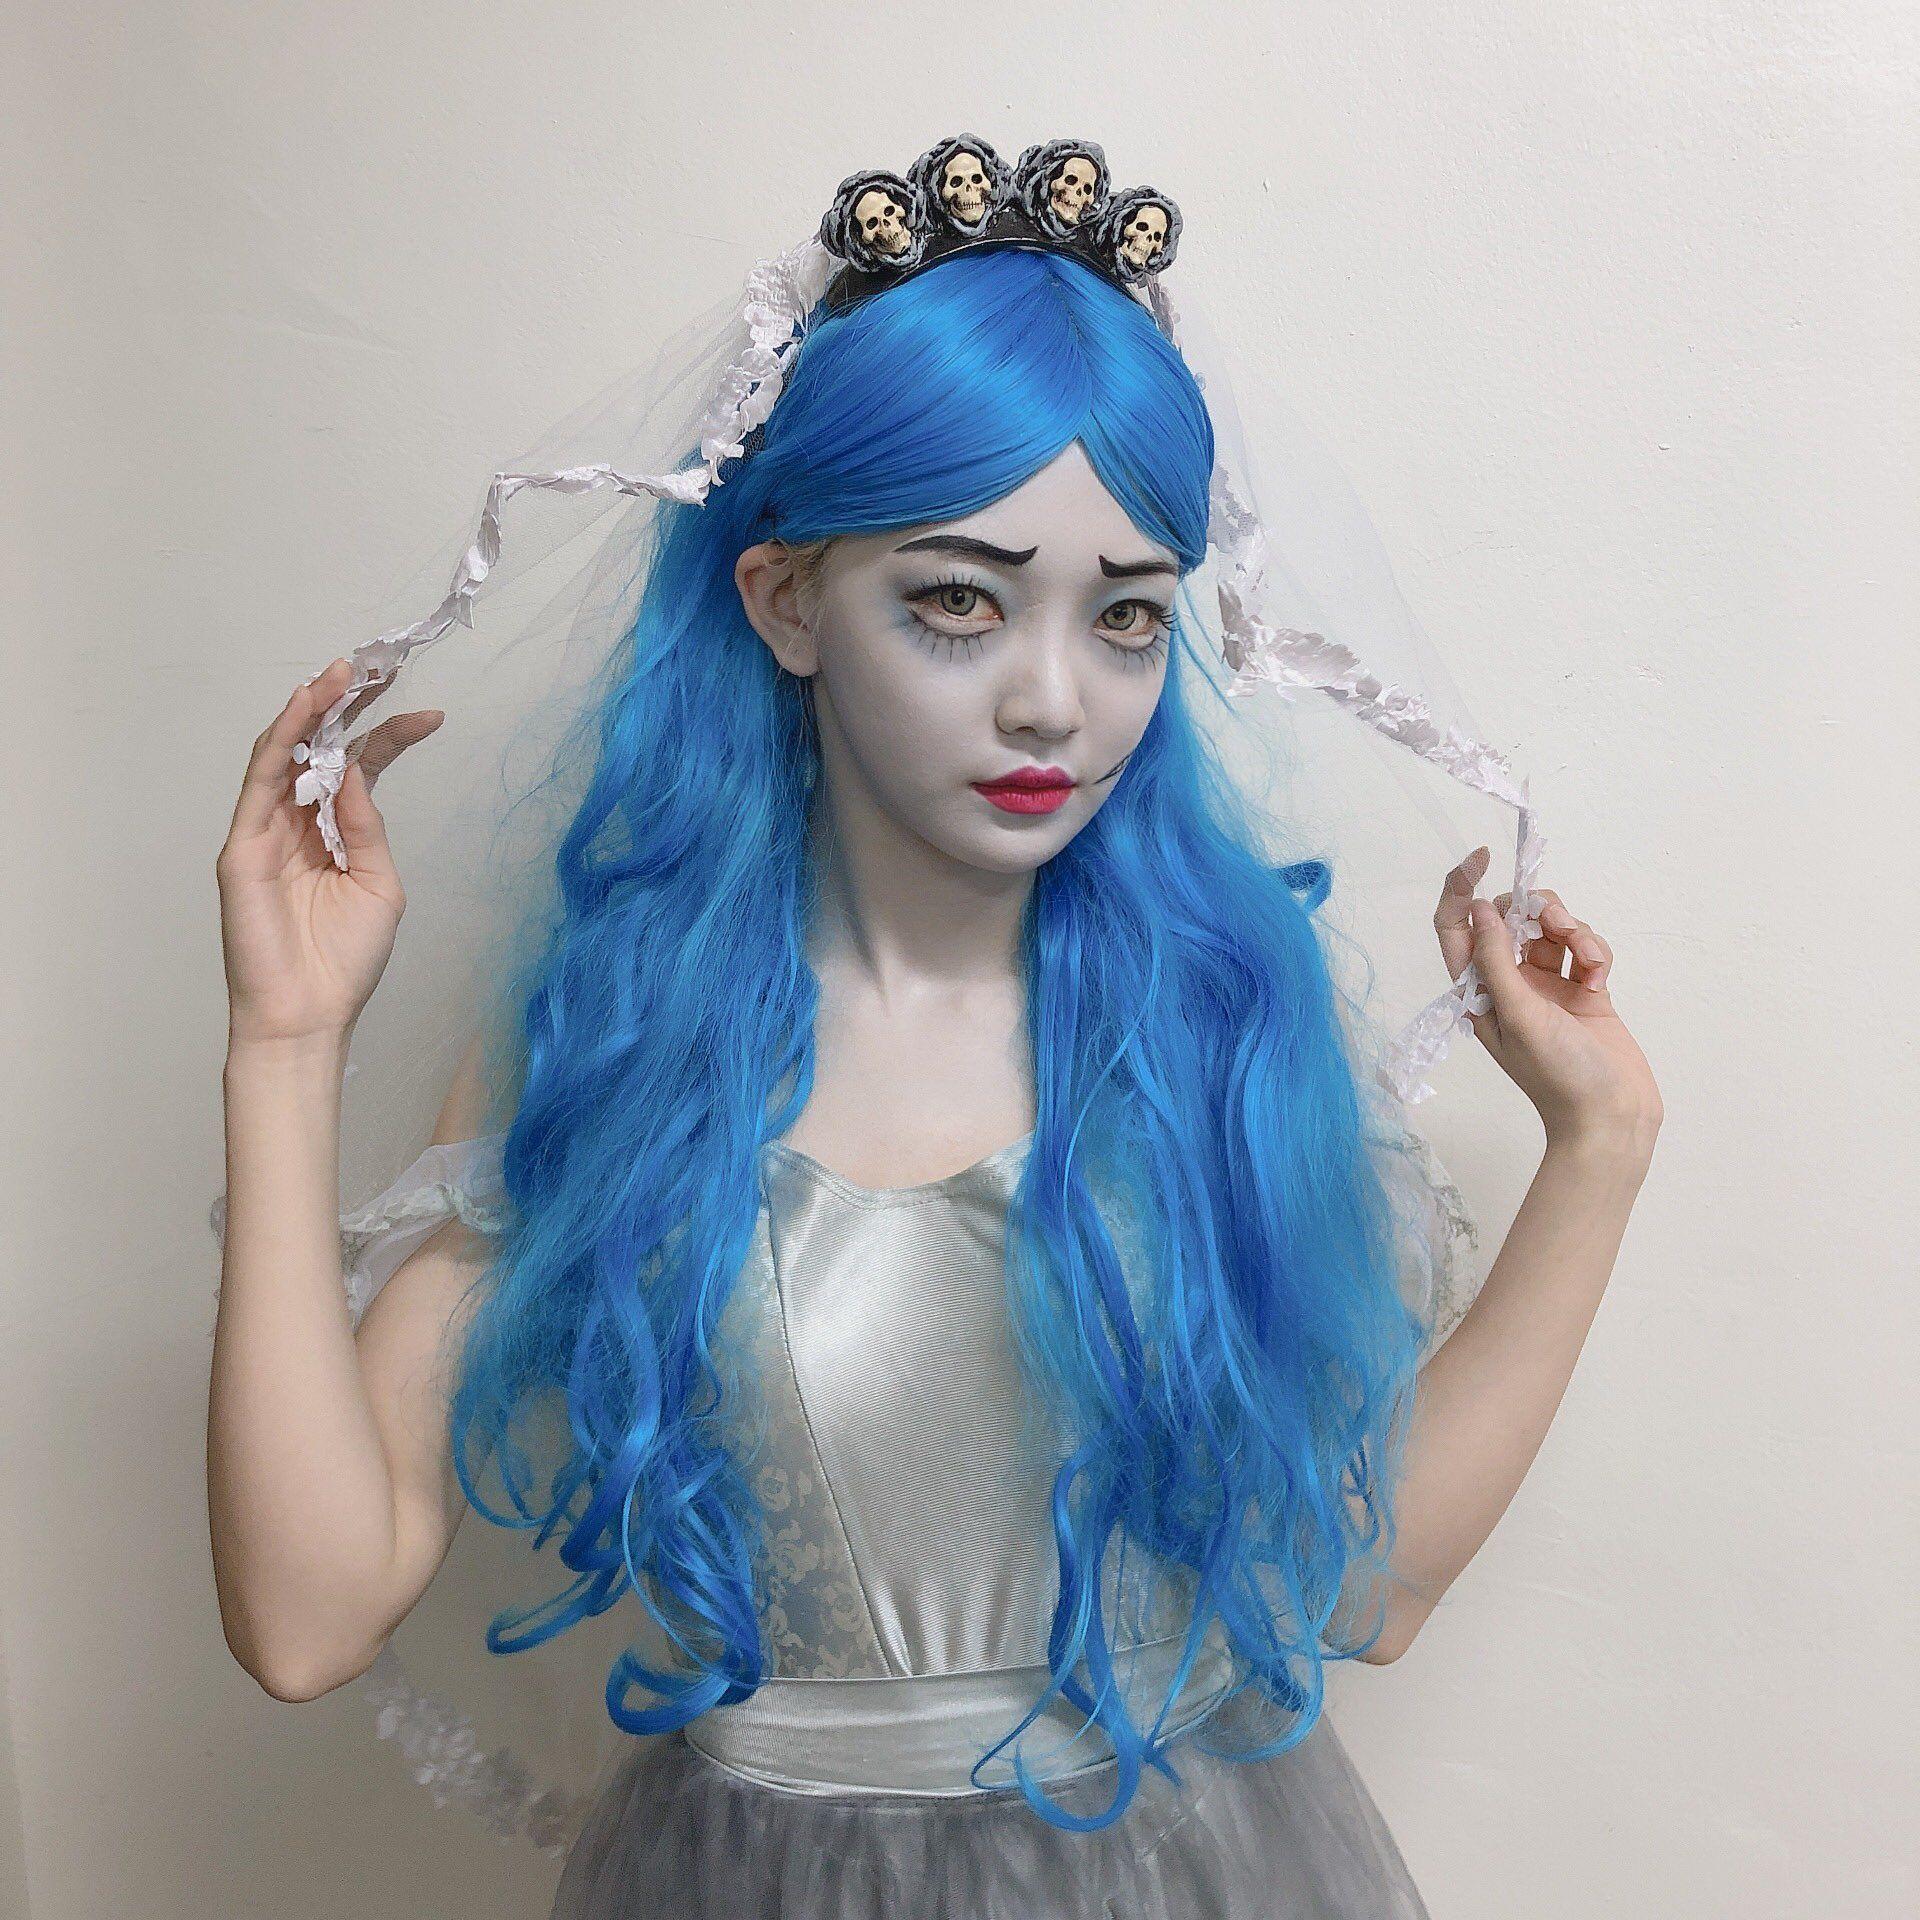 EVERGLOW(에버글로우) on Twitter Corpse bride costume, Disney